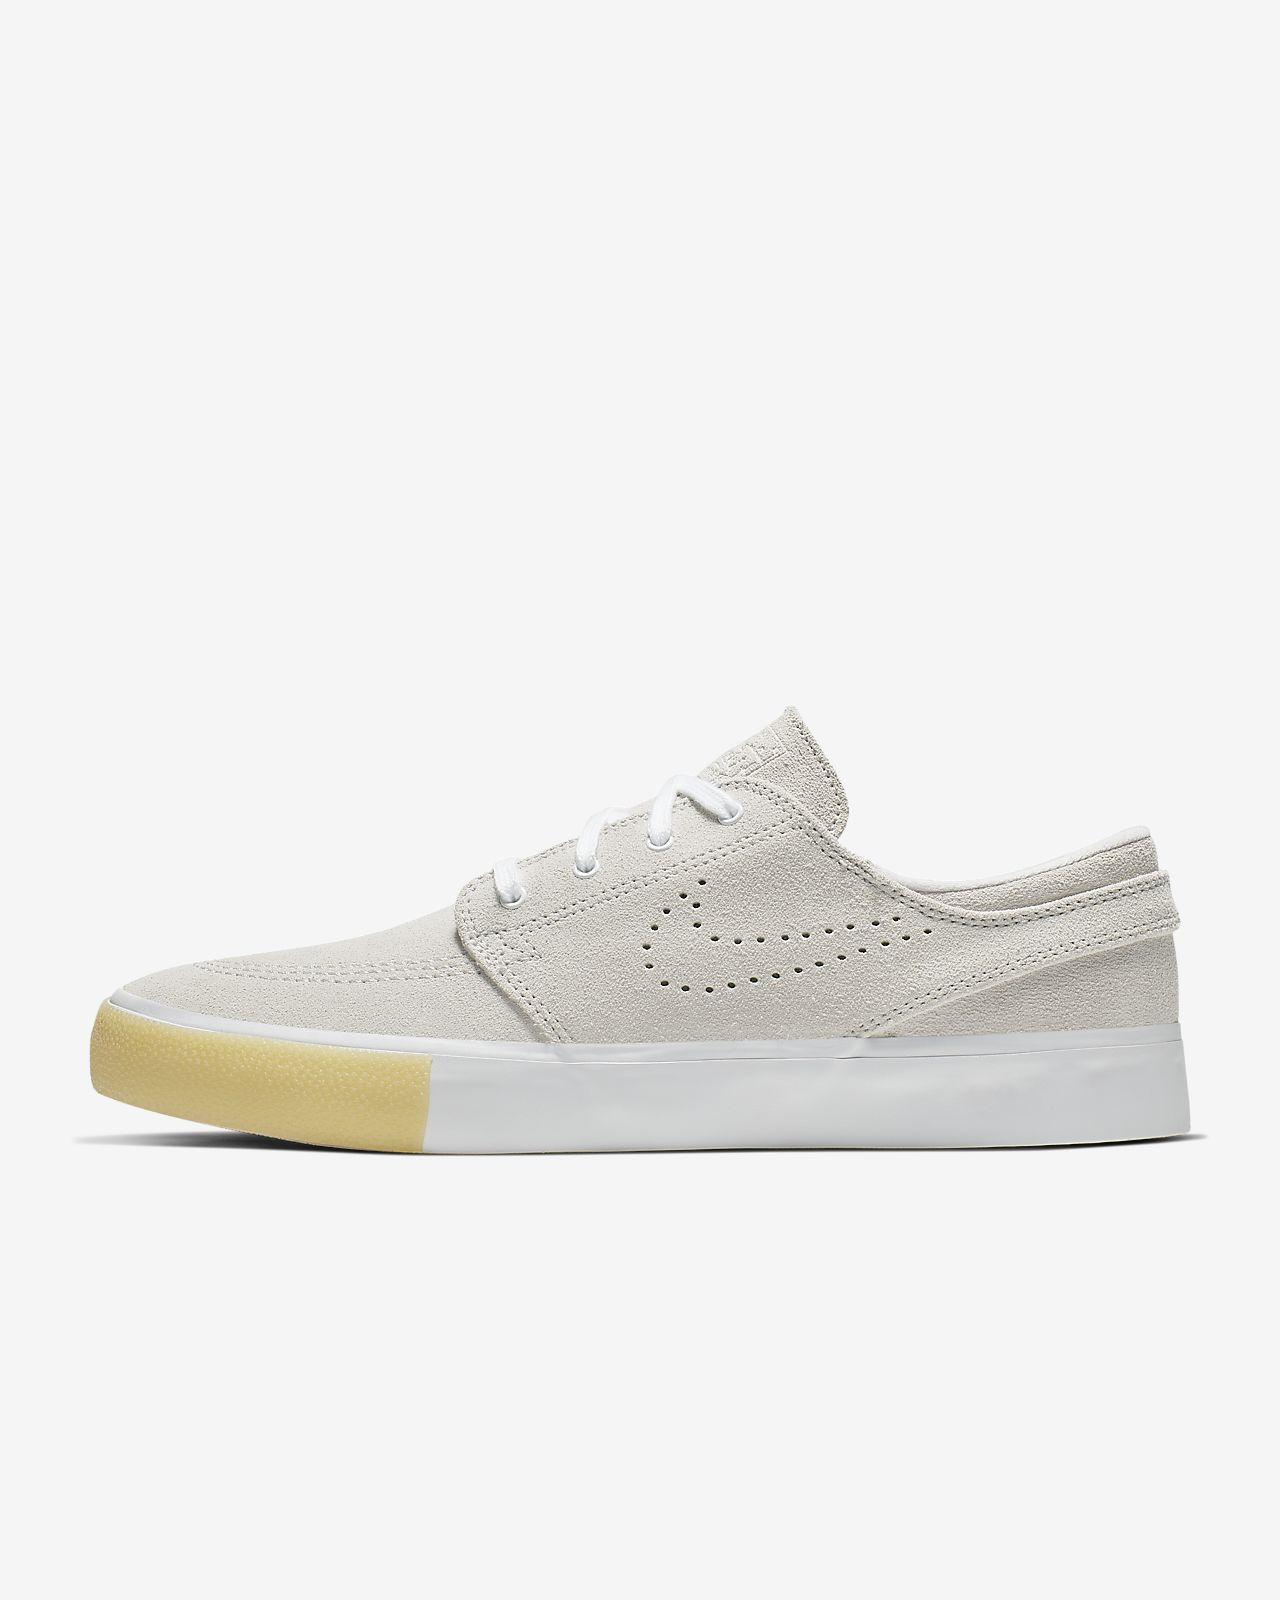 Nike SB Zoom Stefan Janoski RM SE Sabatilles de skateboard